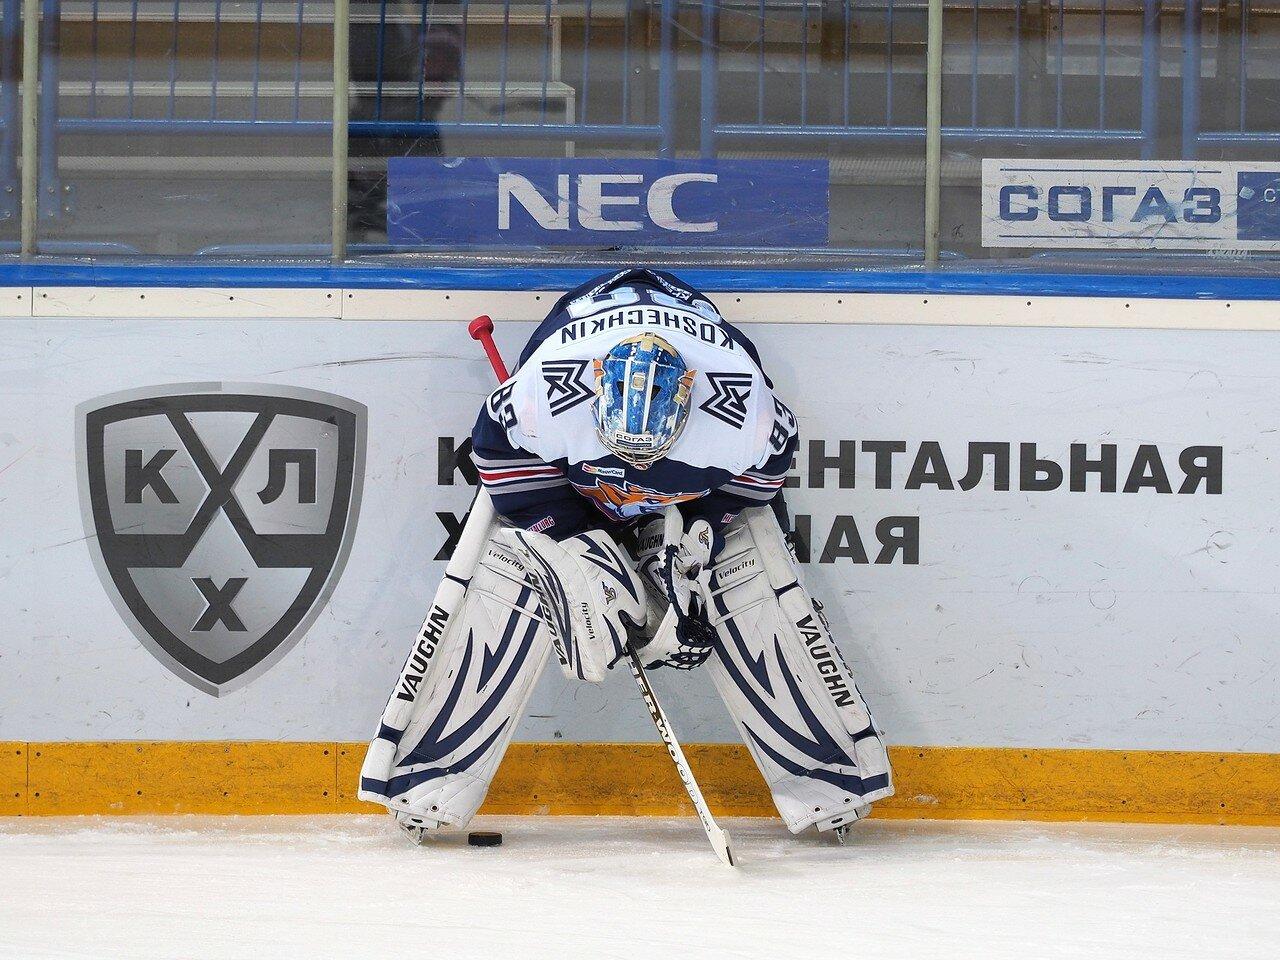 42Плей-офф 2016 Восток Финал Металлург - Салават Юлаев 23.03.2016